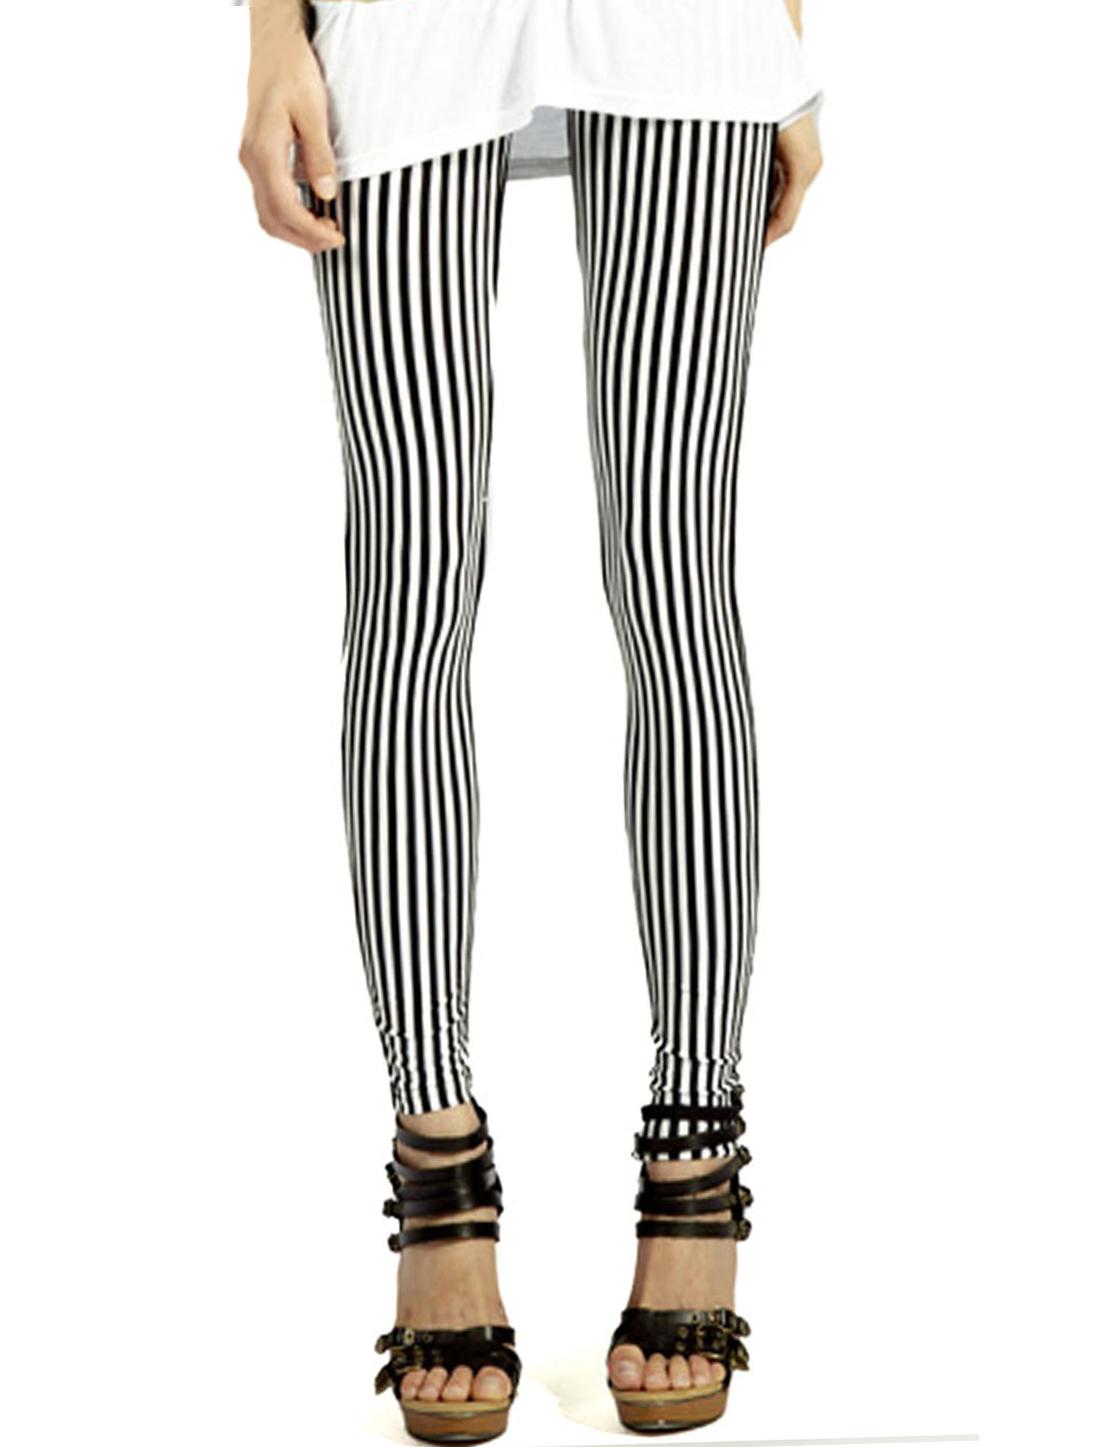 Ladies Stretchy Waist Stripes Full Length Fashion Leggings Black White XS